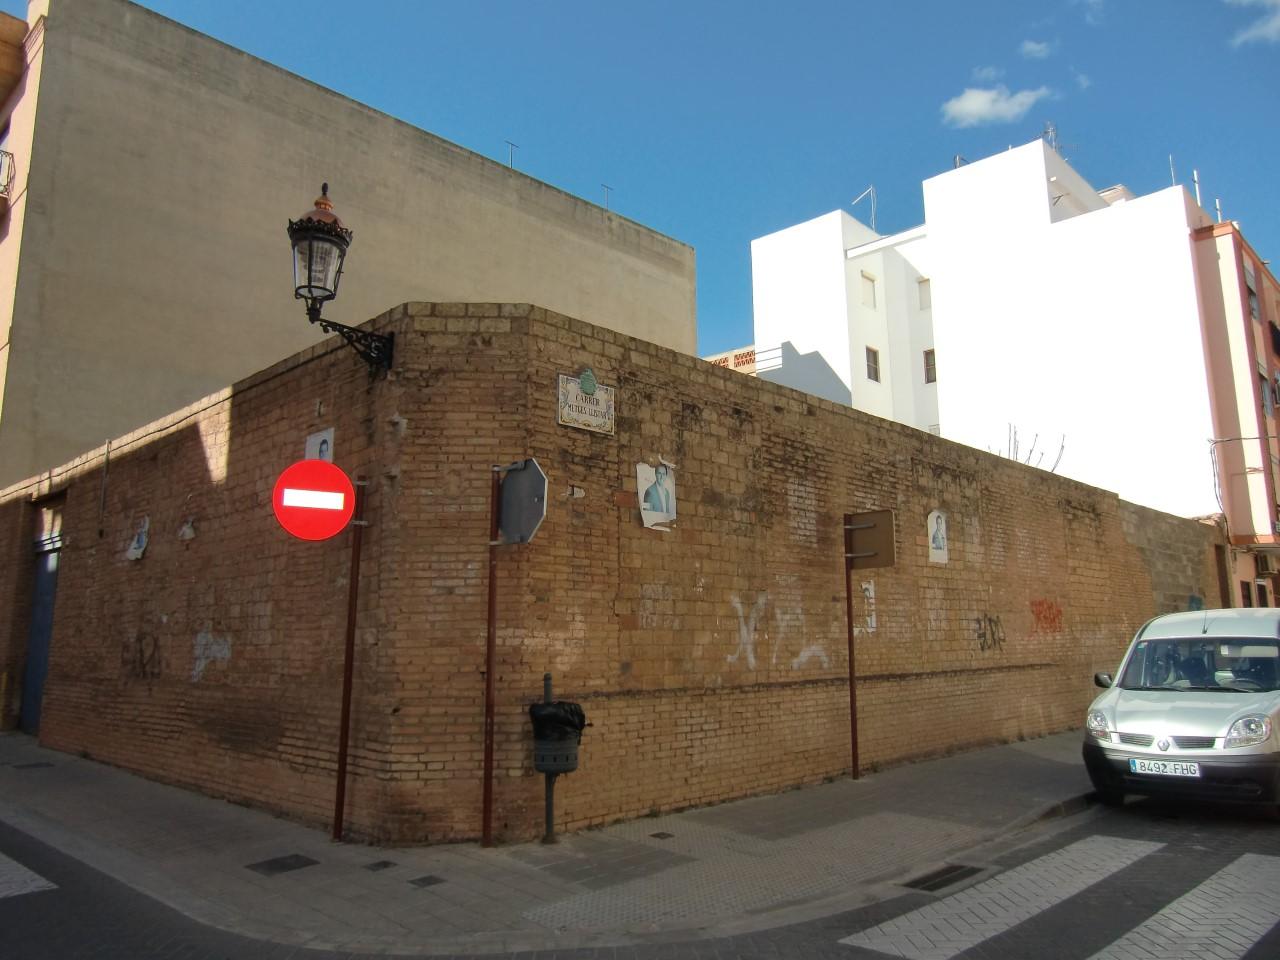 Terrain urbain  Alboraya ,centro histórico